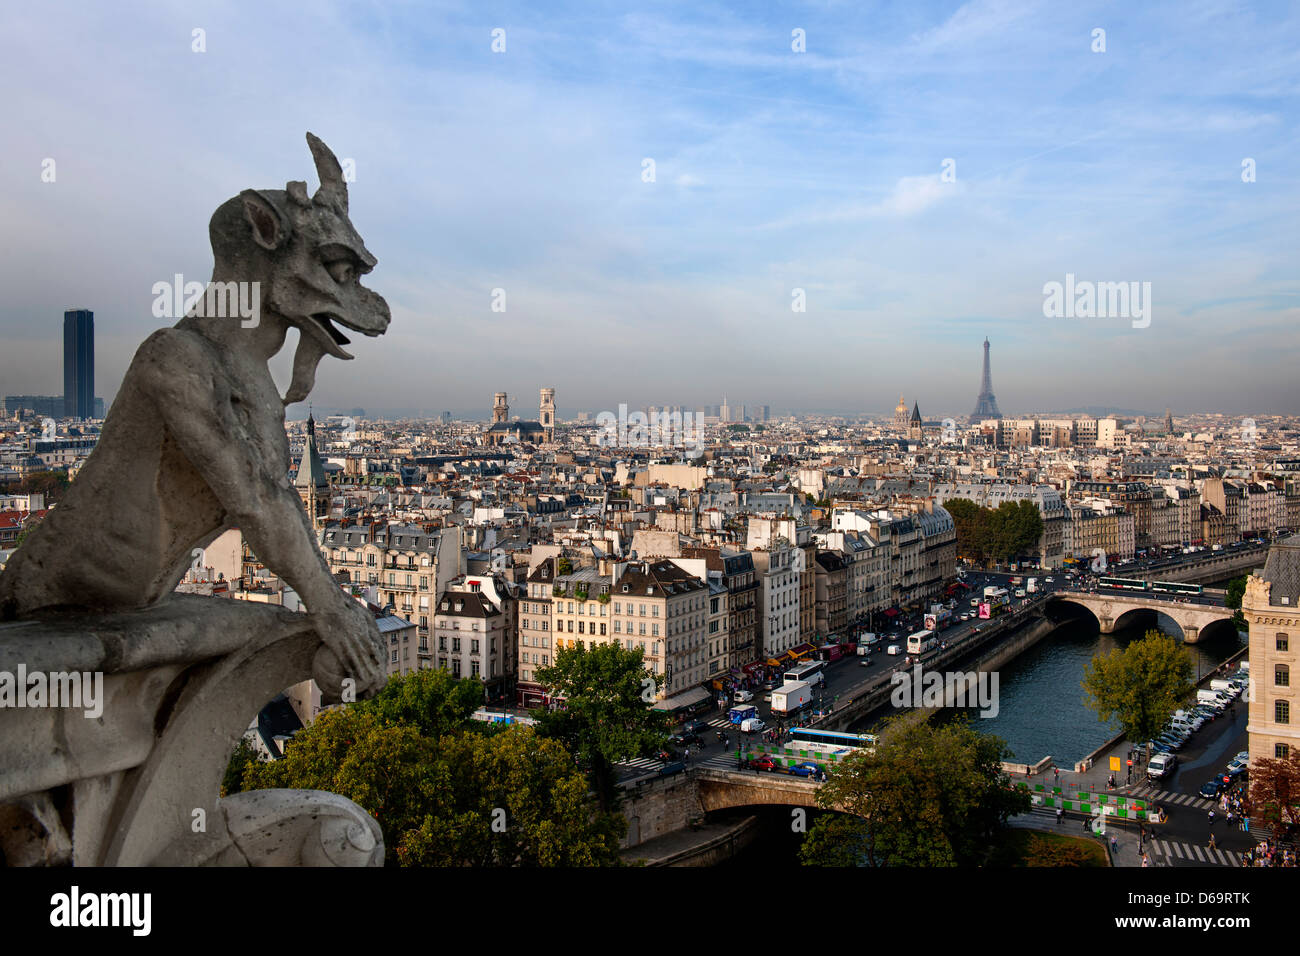 Notre Dame gargoyle overlooking Paris - Stock Image